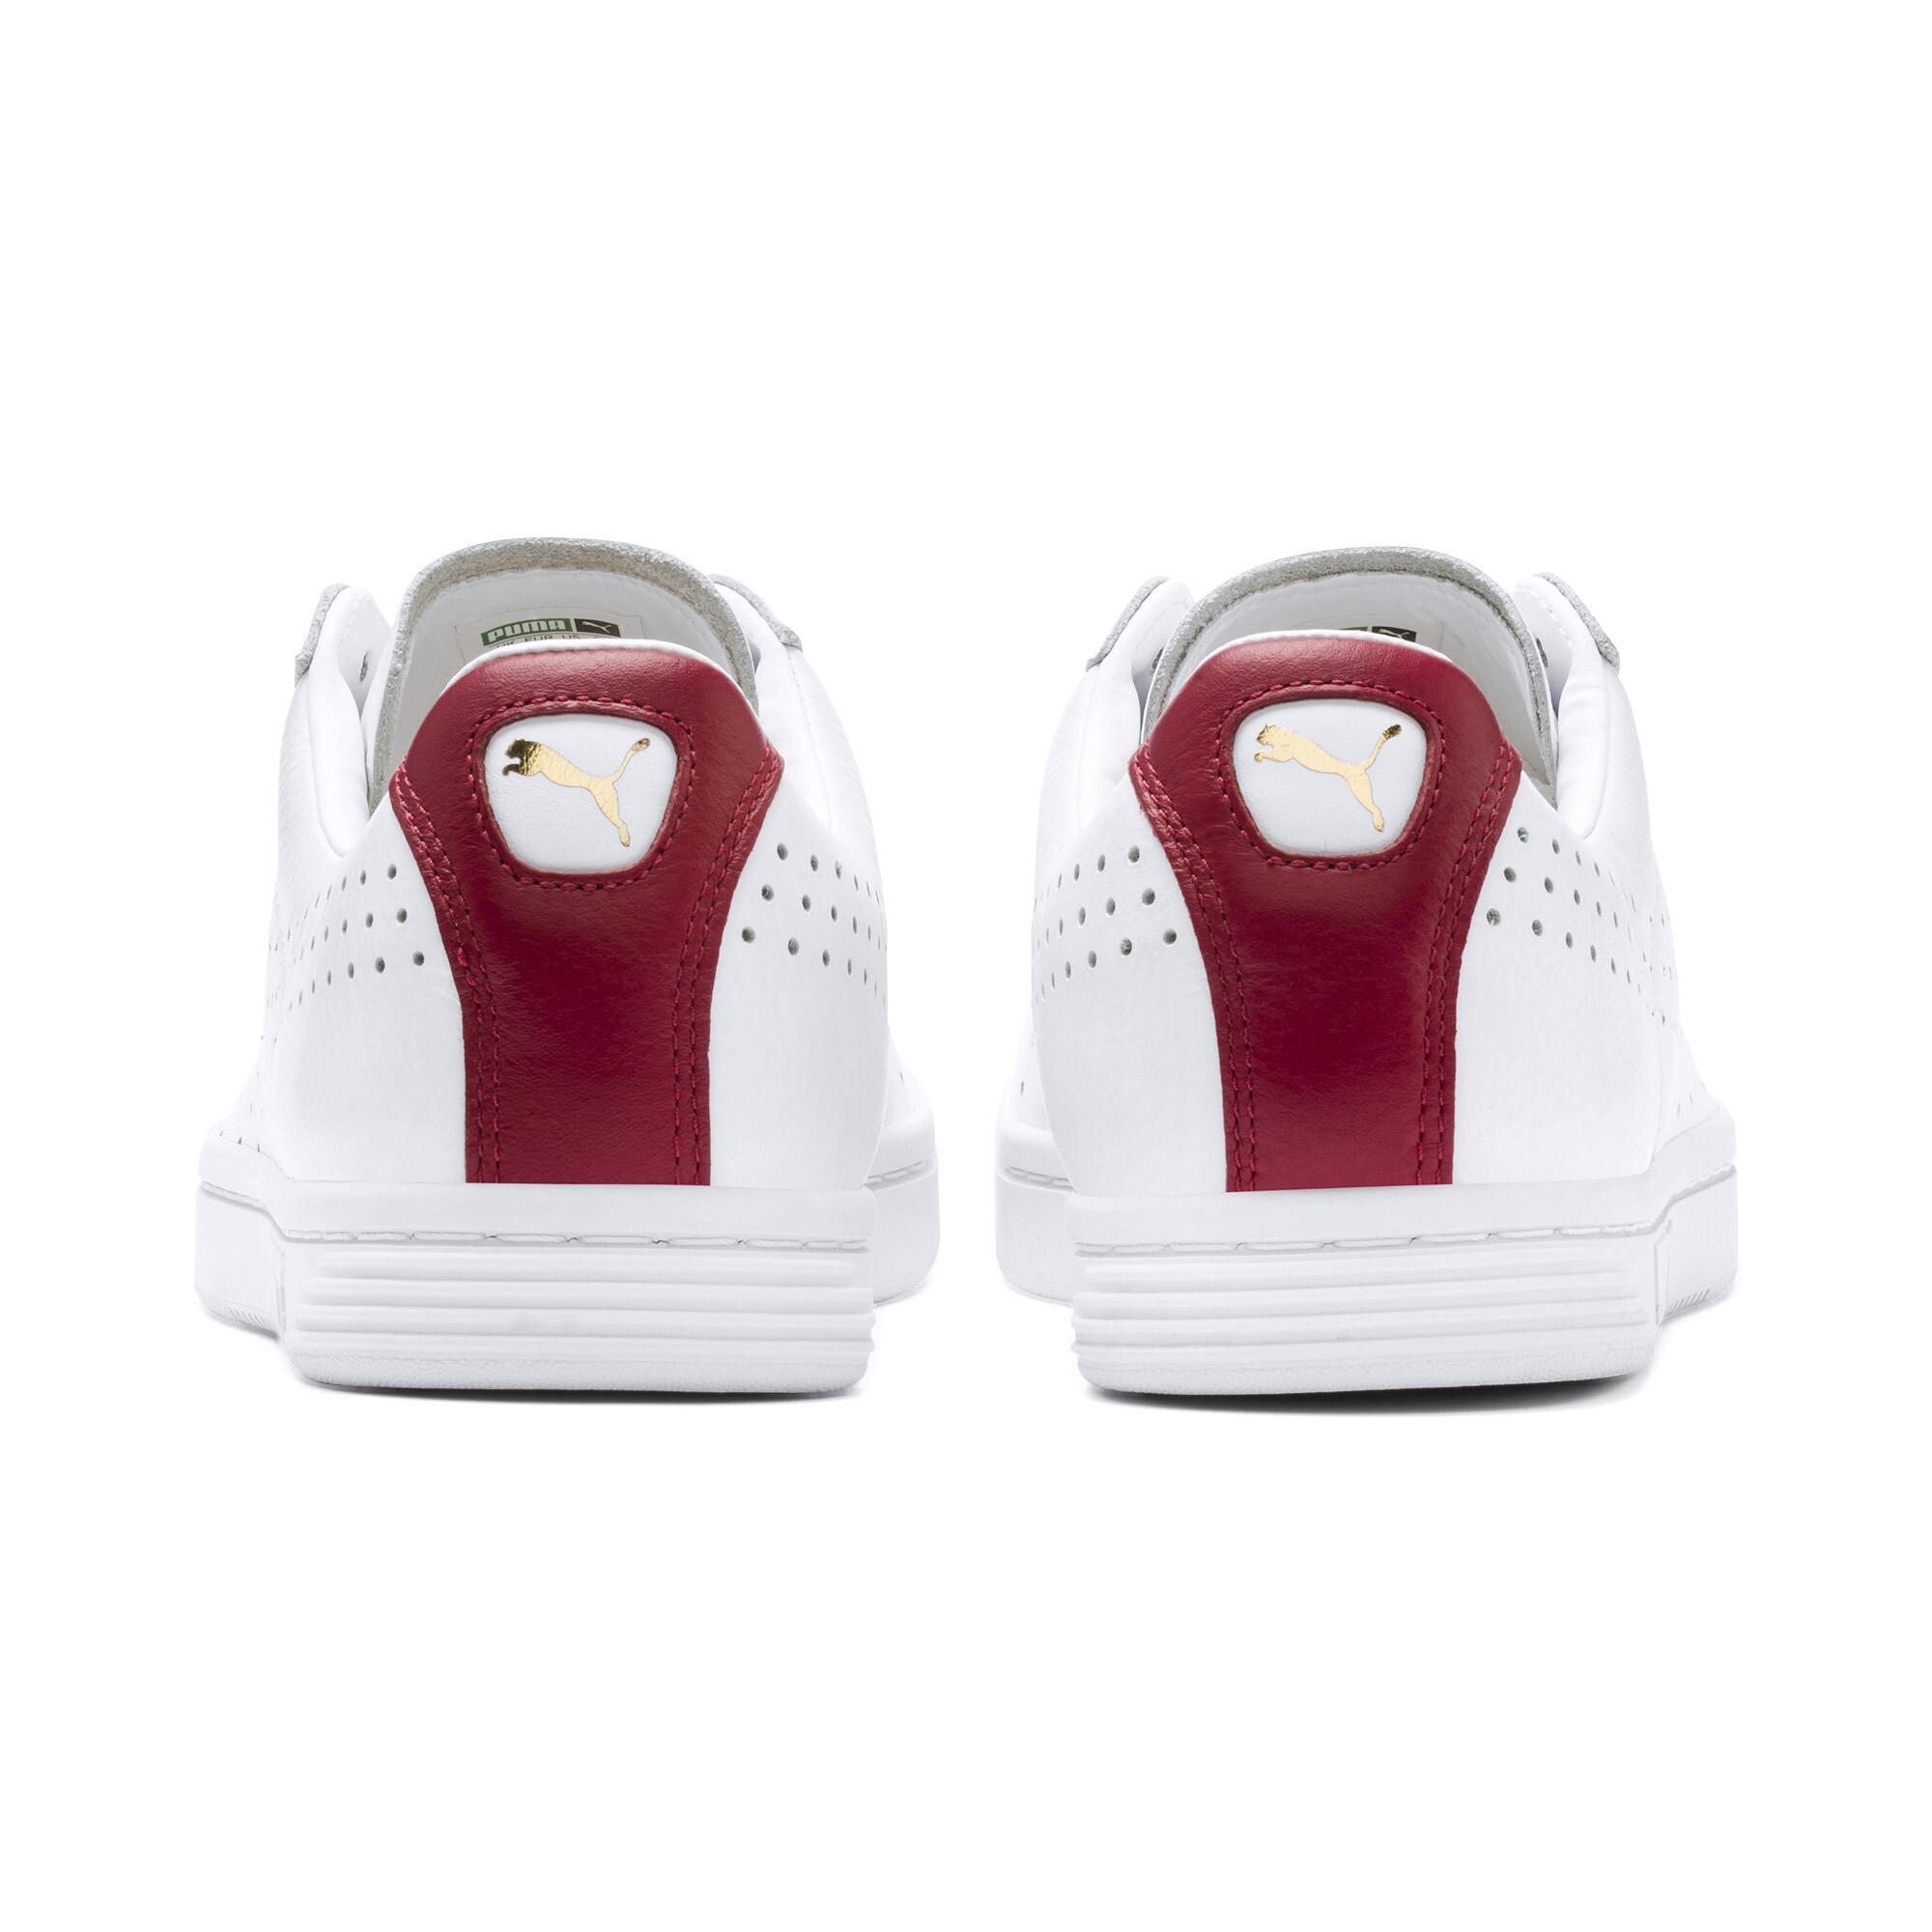 PUMA-Court-Star-Men-039-s-Sneakers-Unisex-Shoe-Sport-Classics thumbnail 10